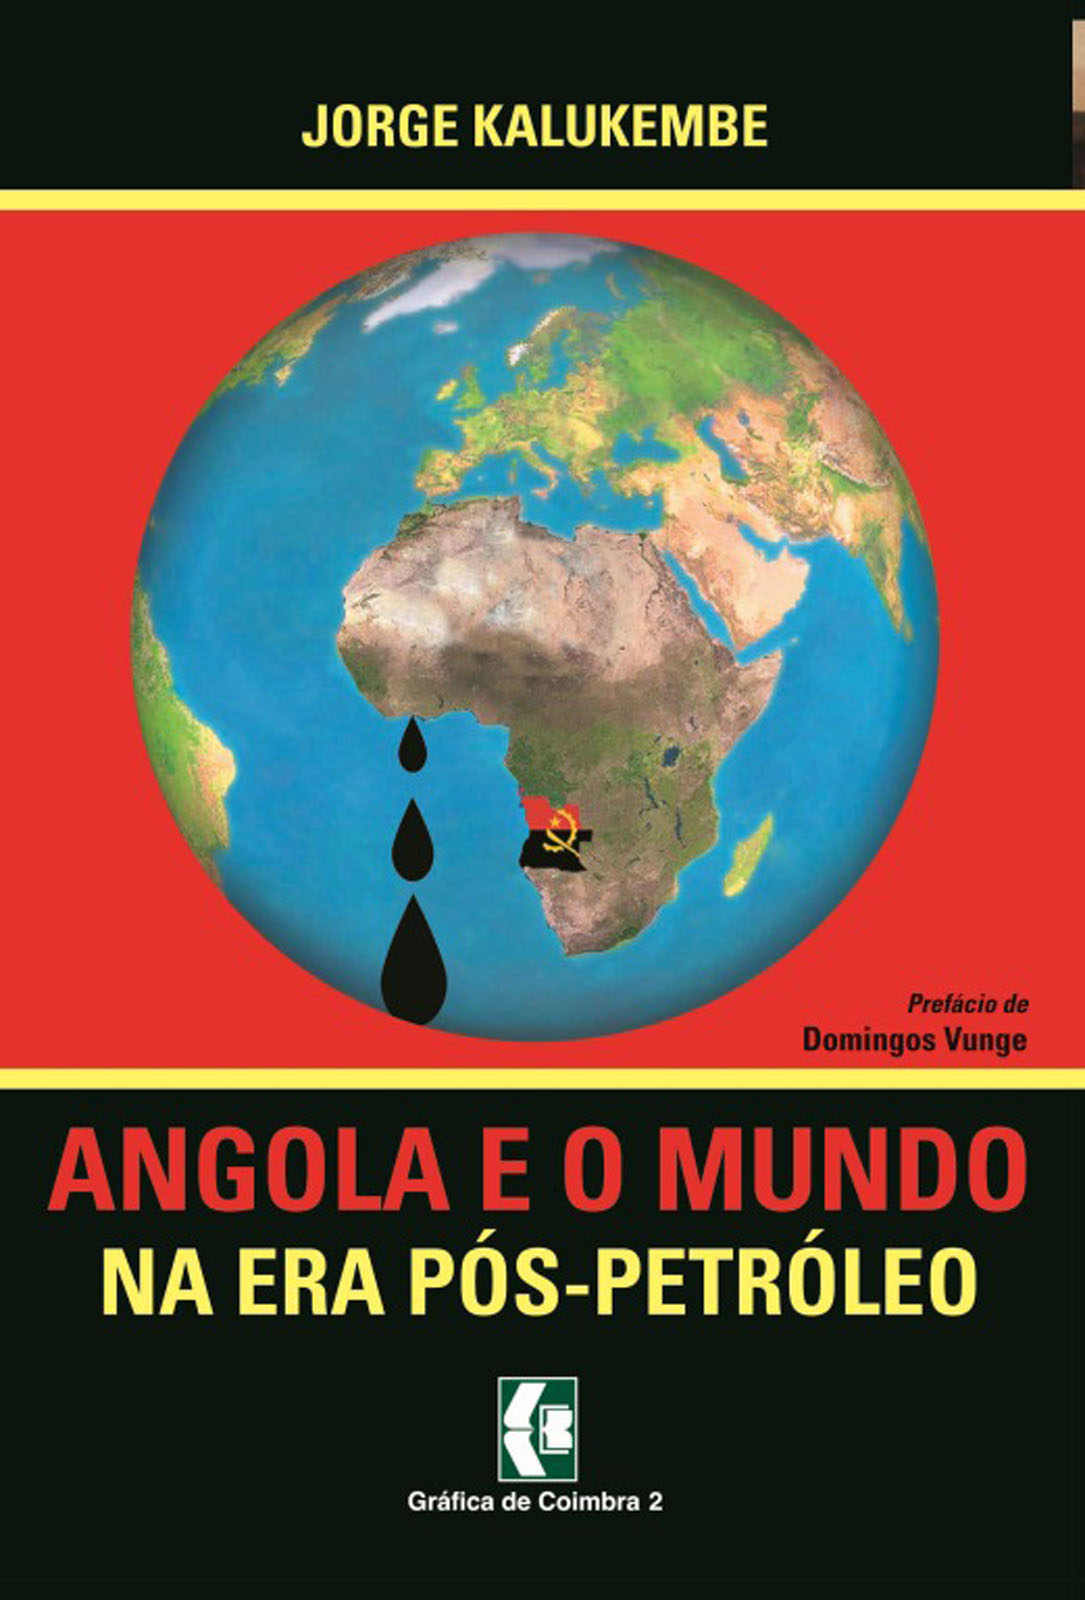 "Angola e o Mundo na era Pós-Petróleo"""